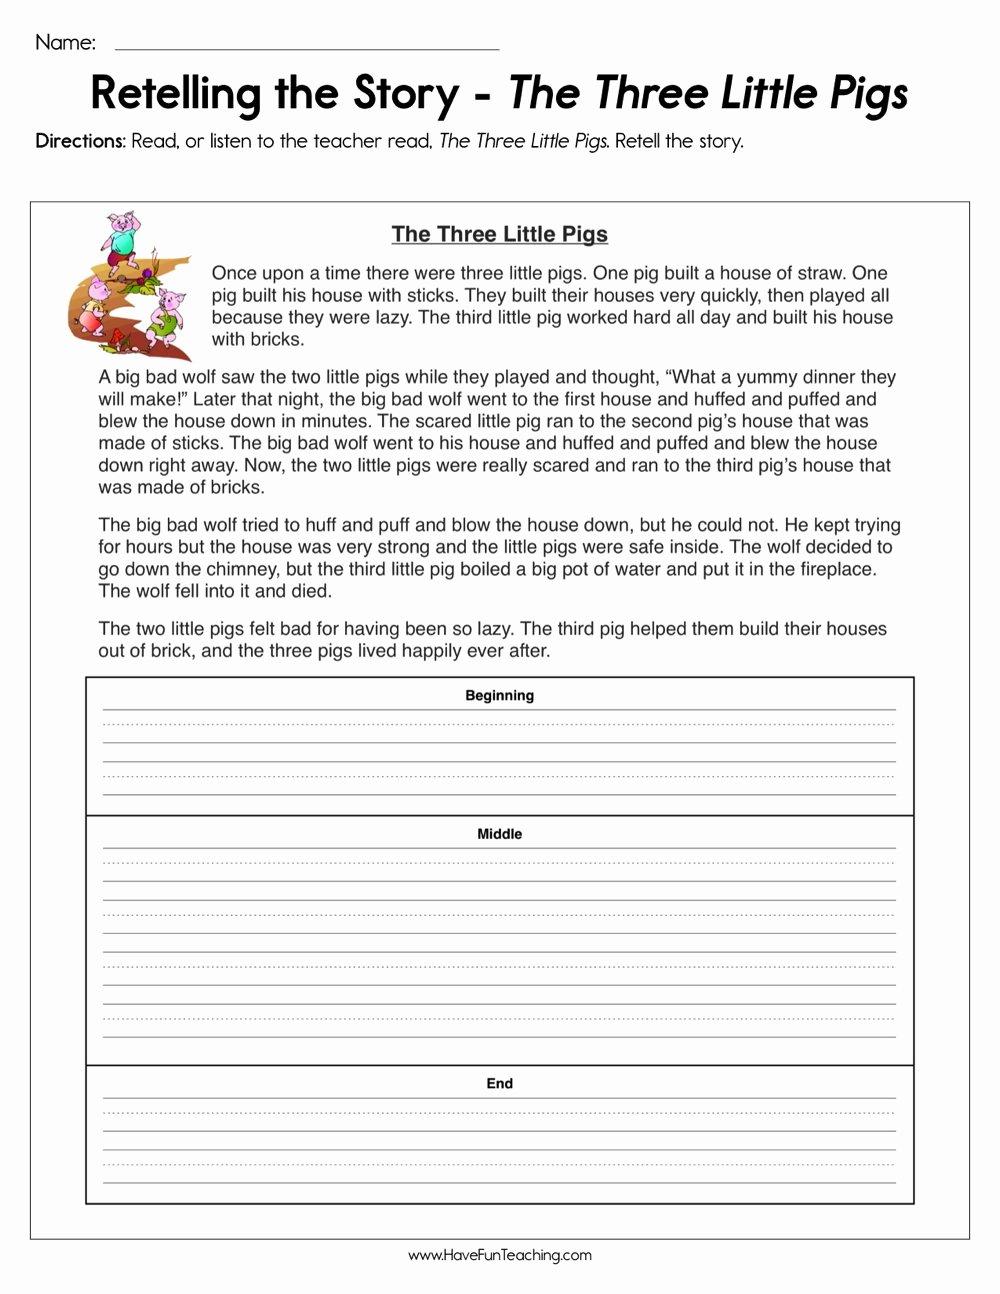 Retelling A Story Worksheet Beautiful Resources Reading Summarizing